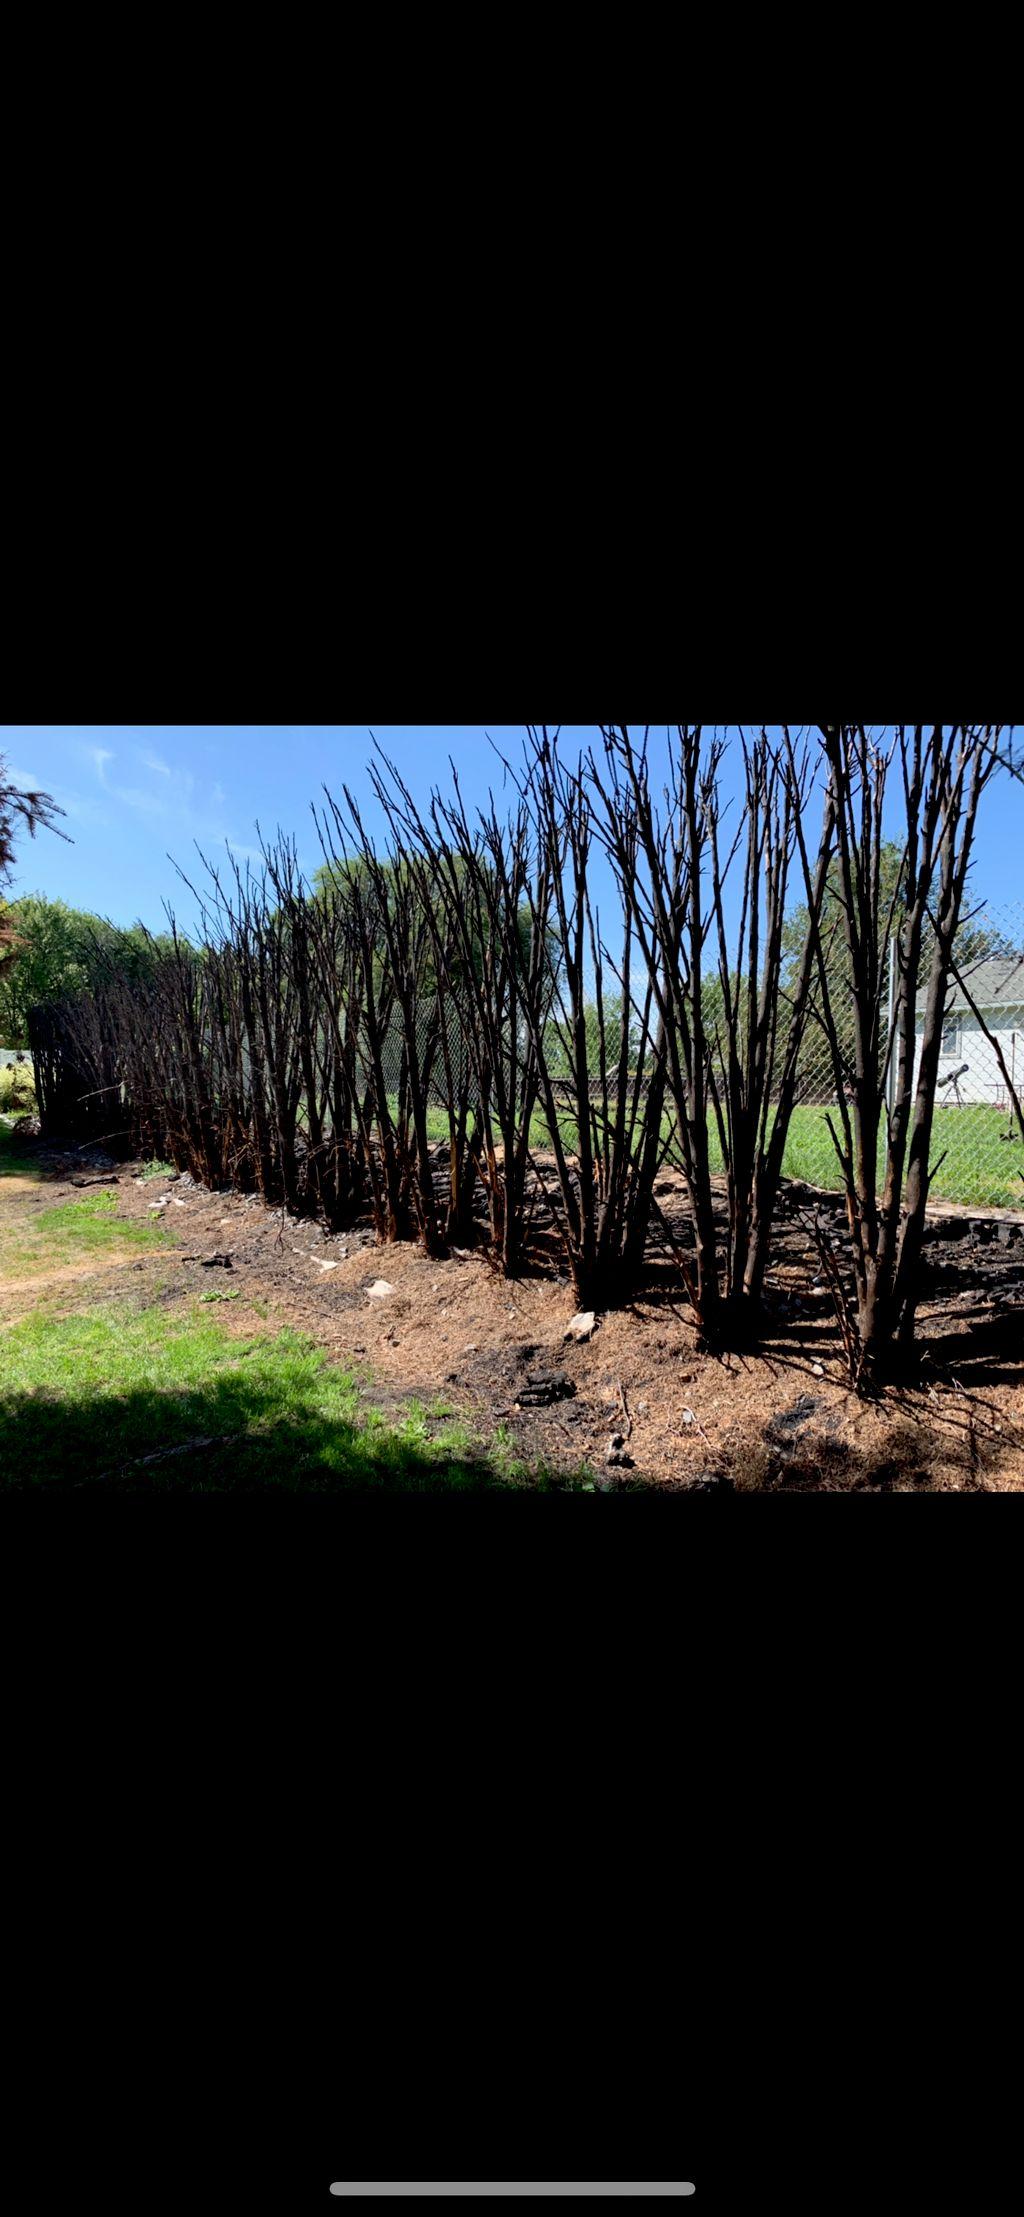 Fire damage, insurance claim